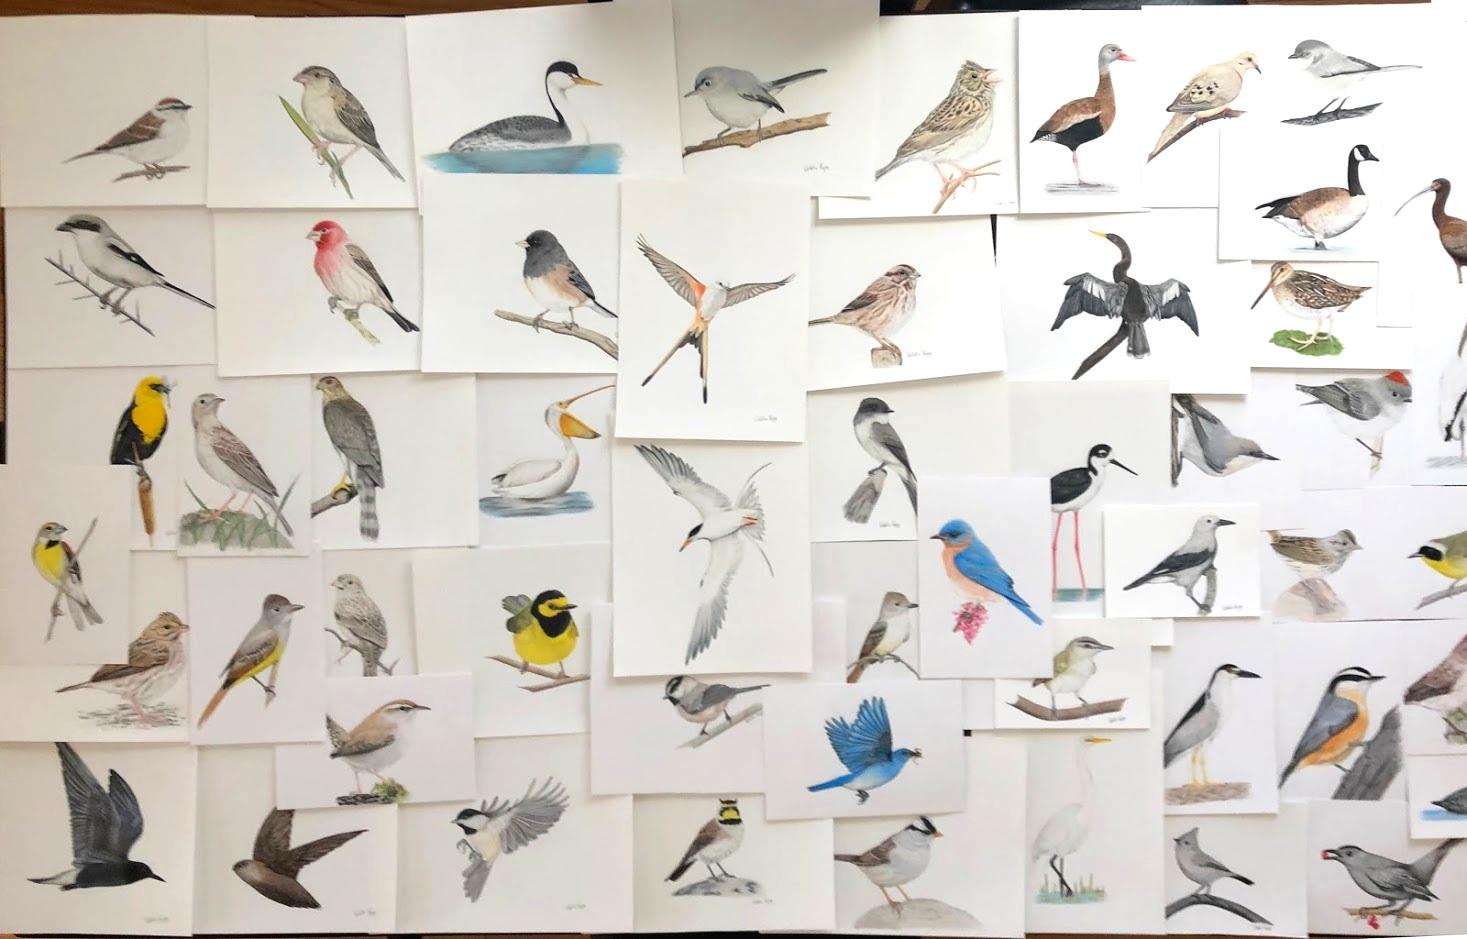 Wingspan illustrations - Natalia Rojas